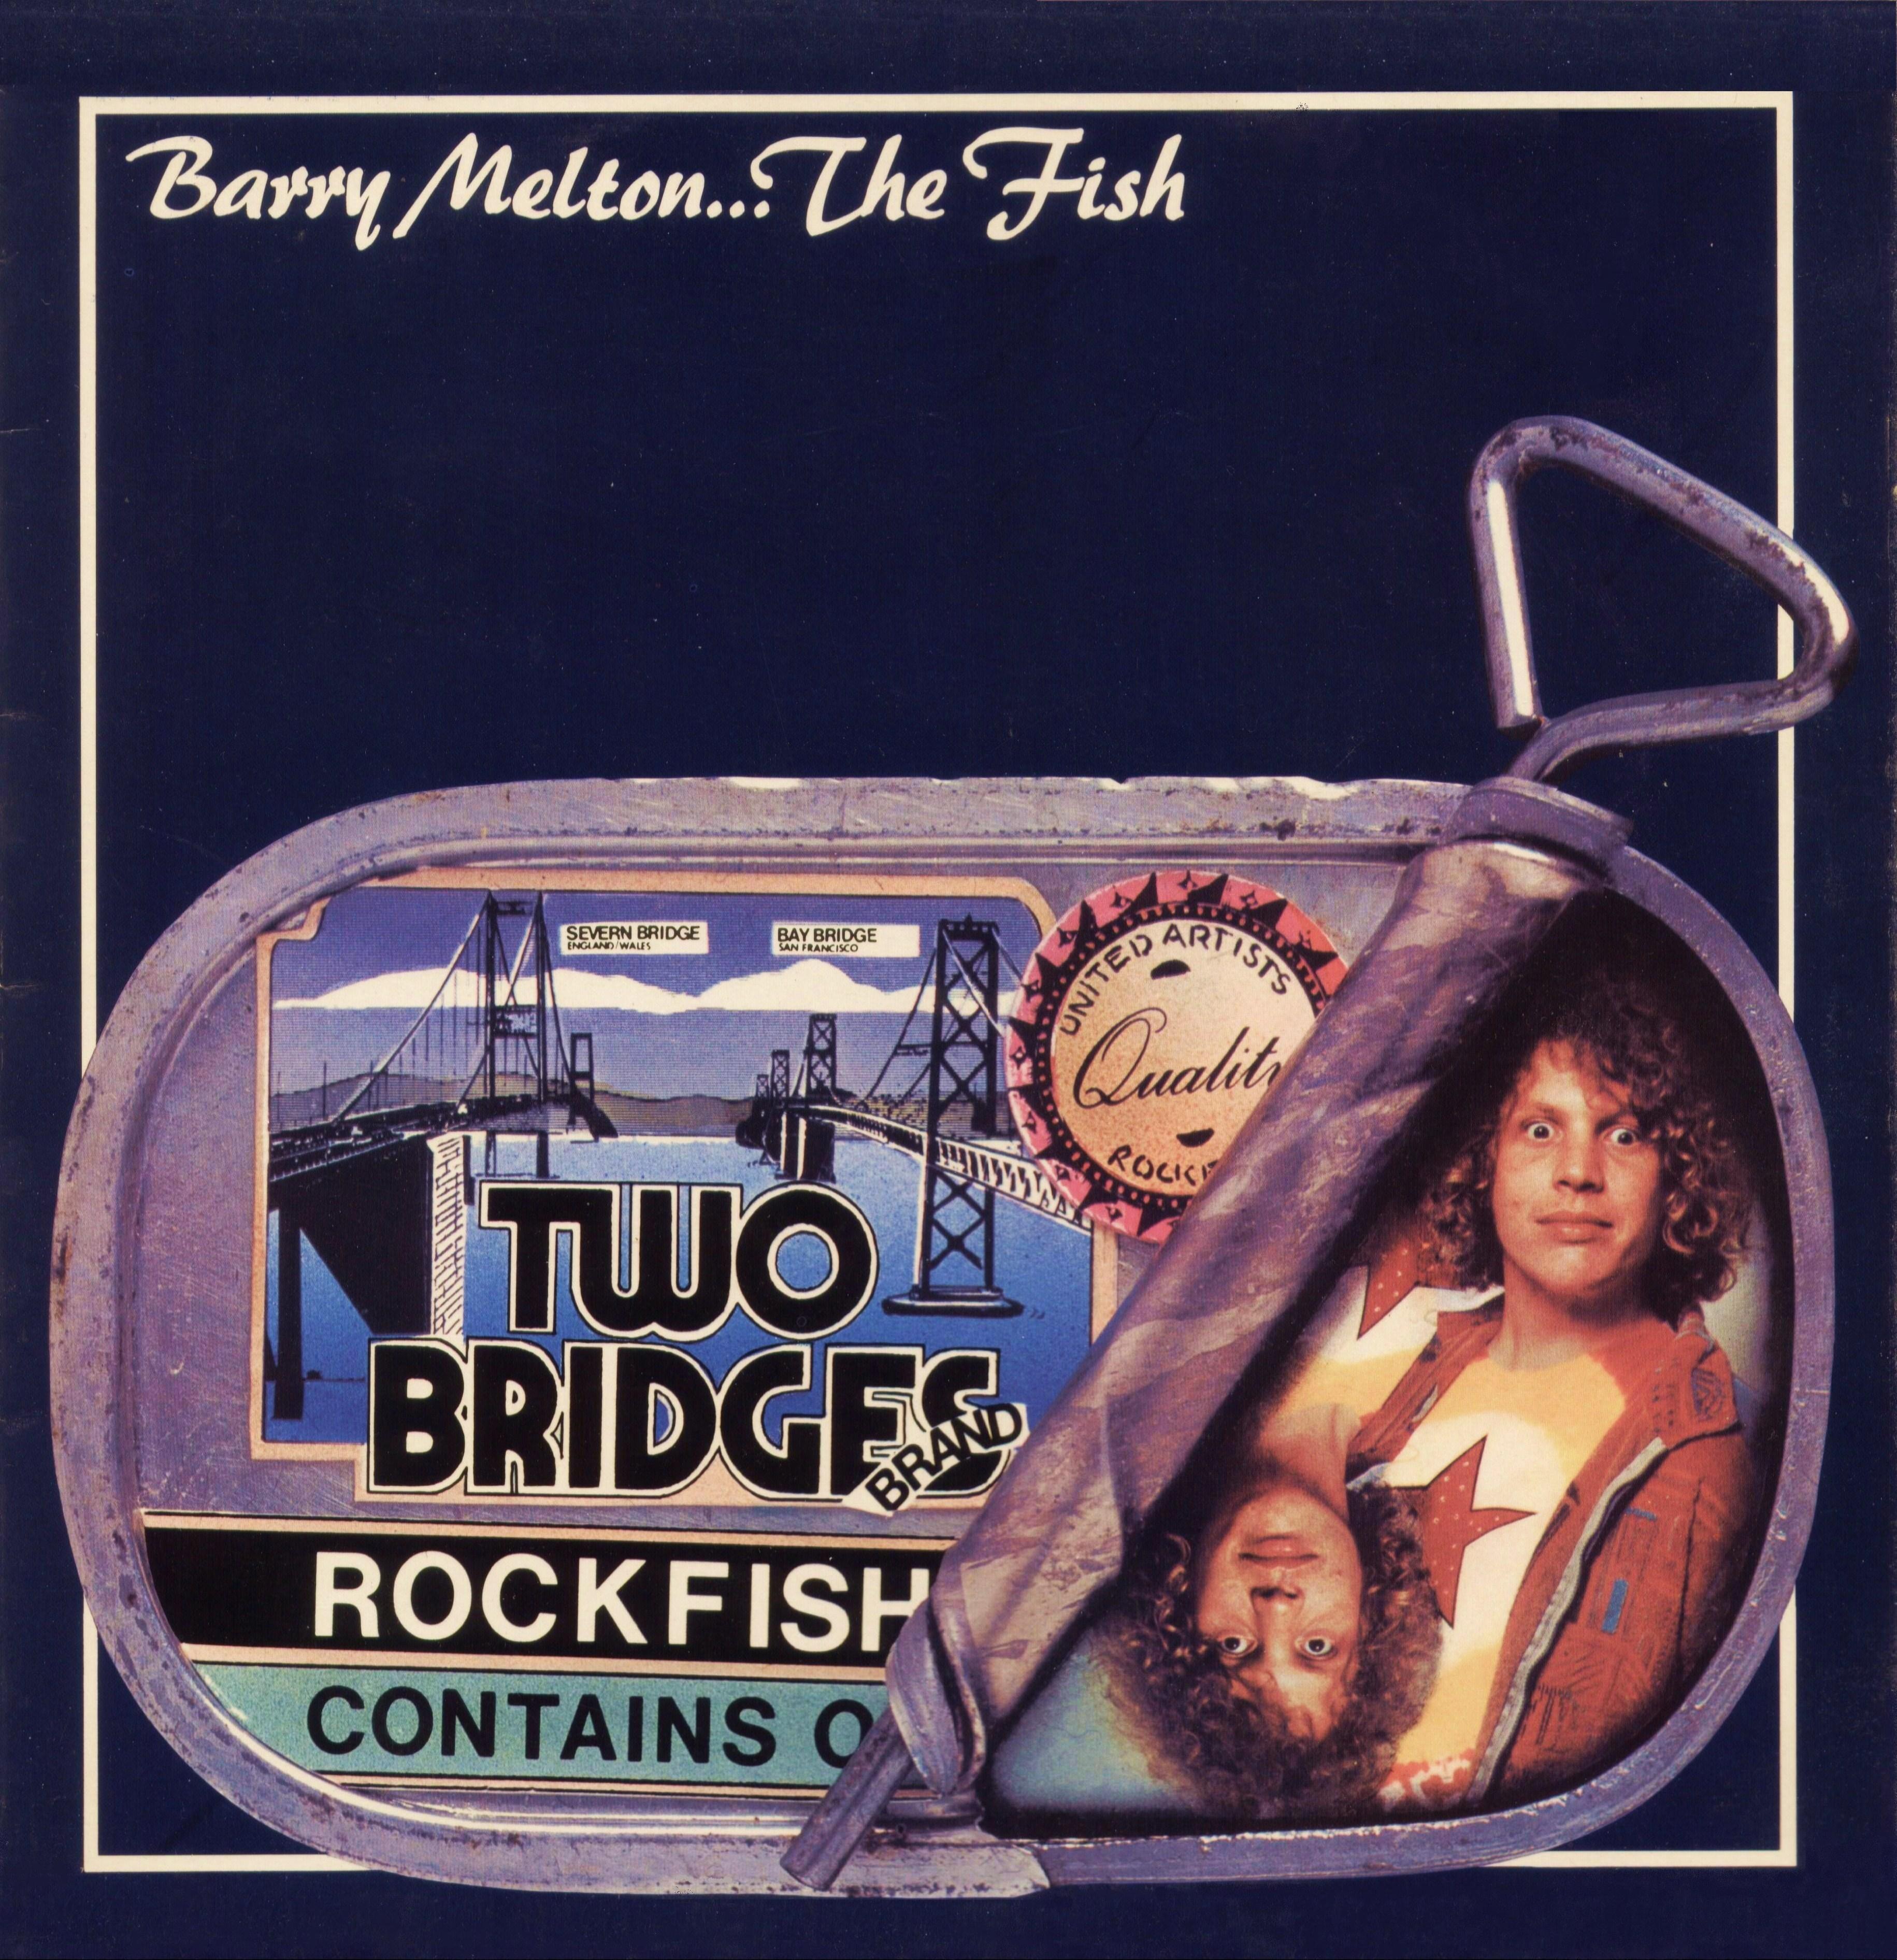 BarryMelton1973-74DemoRecordingsForTheFishAlbum.jpg